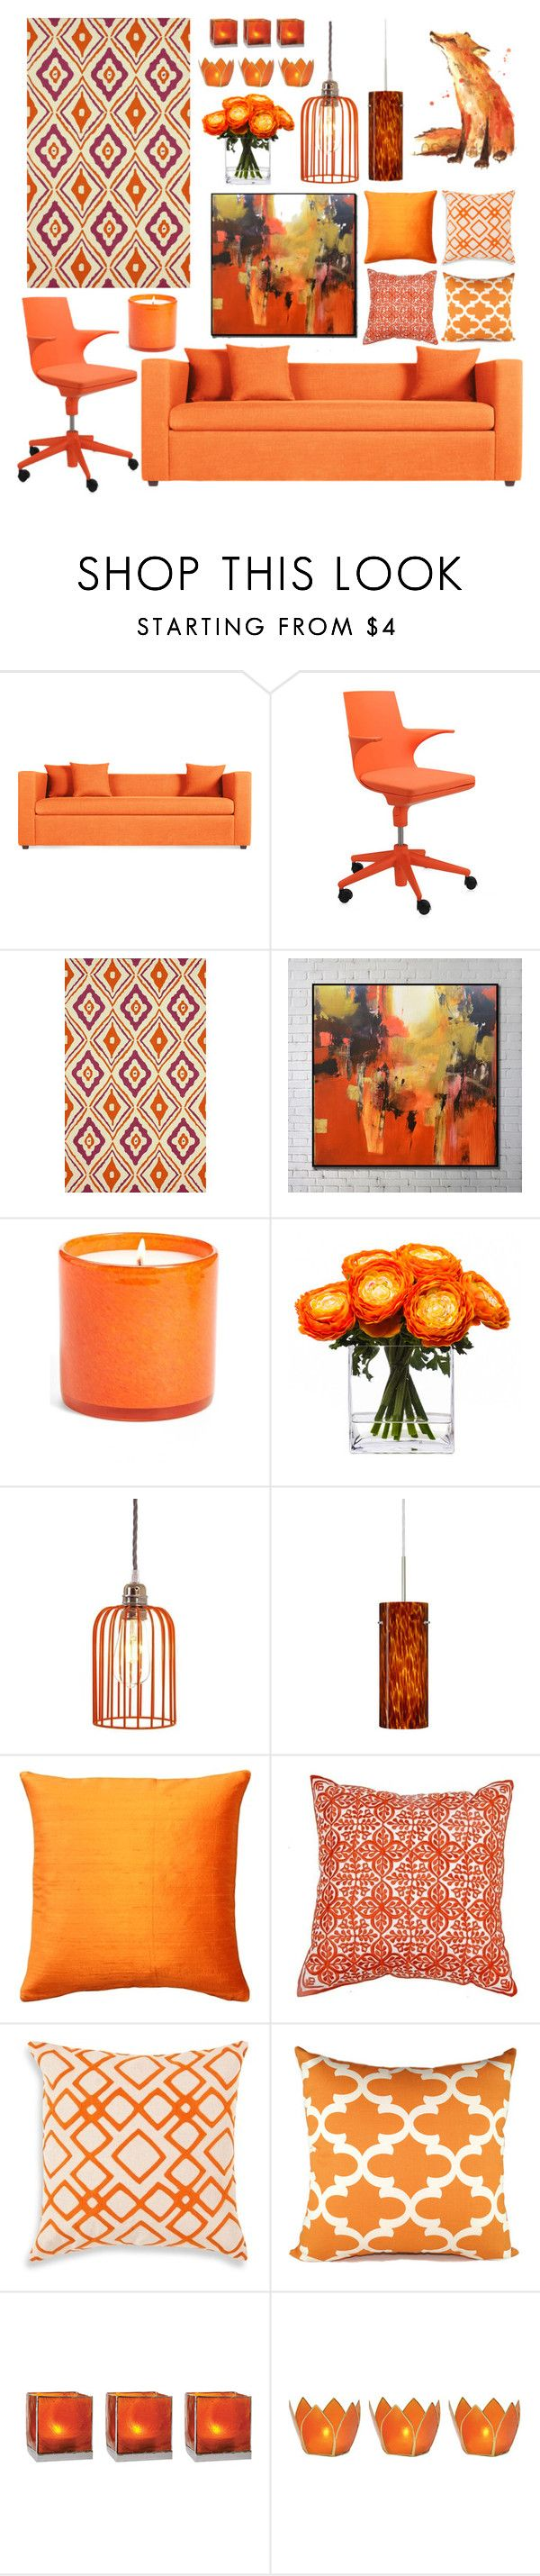 322 best interior - orange images on pinterest | for the home